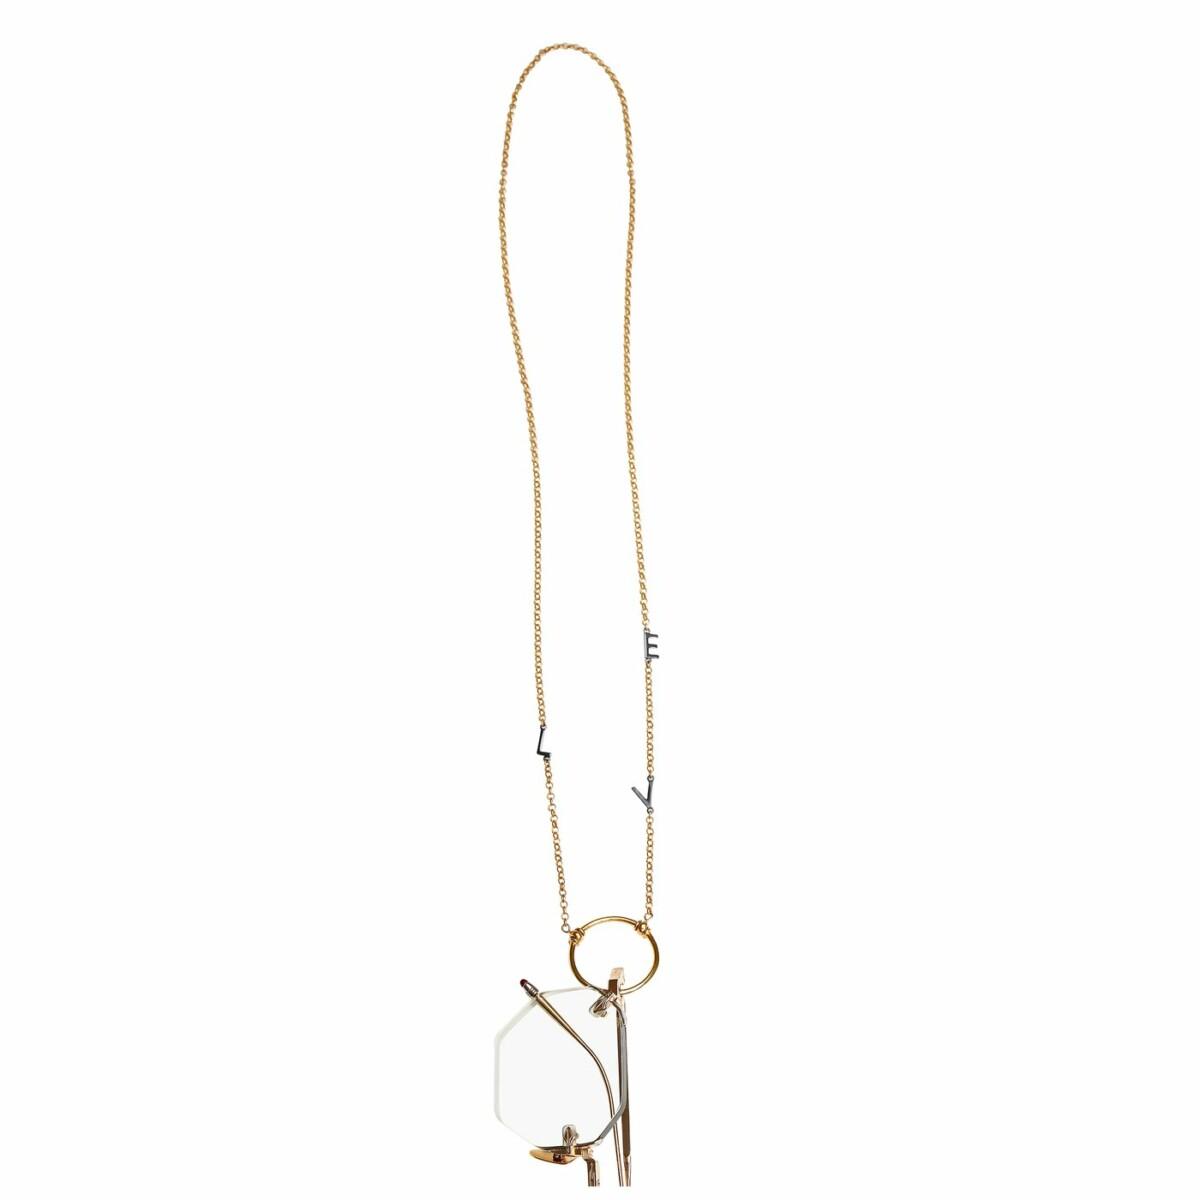 Love Letter eyeglass necklace by La Loop in Gold